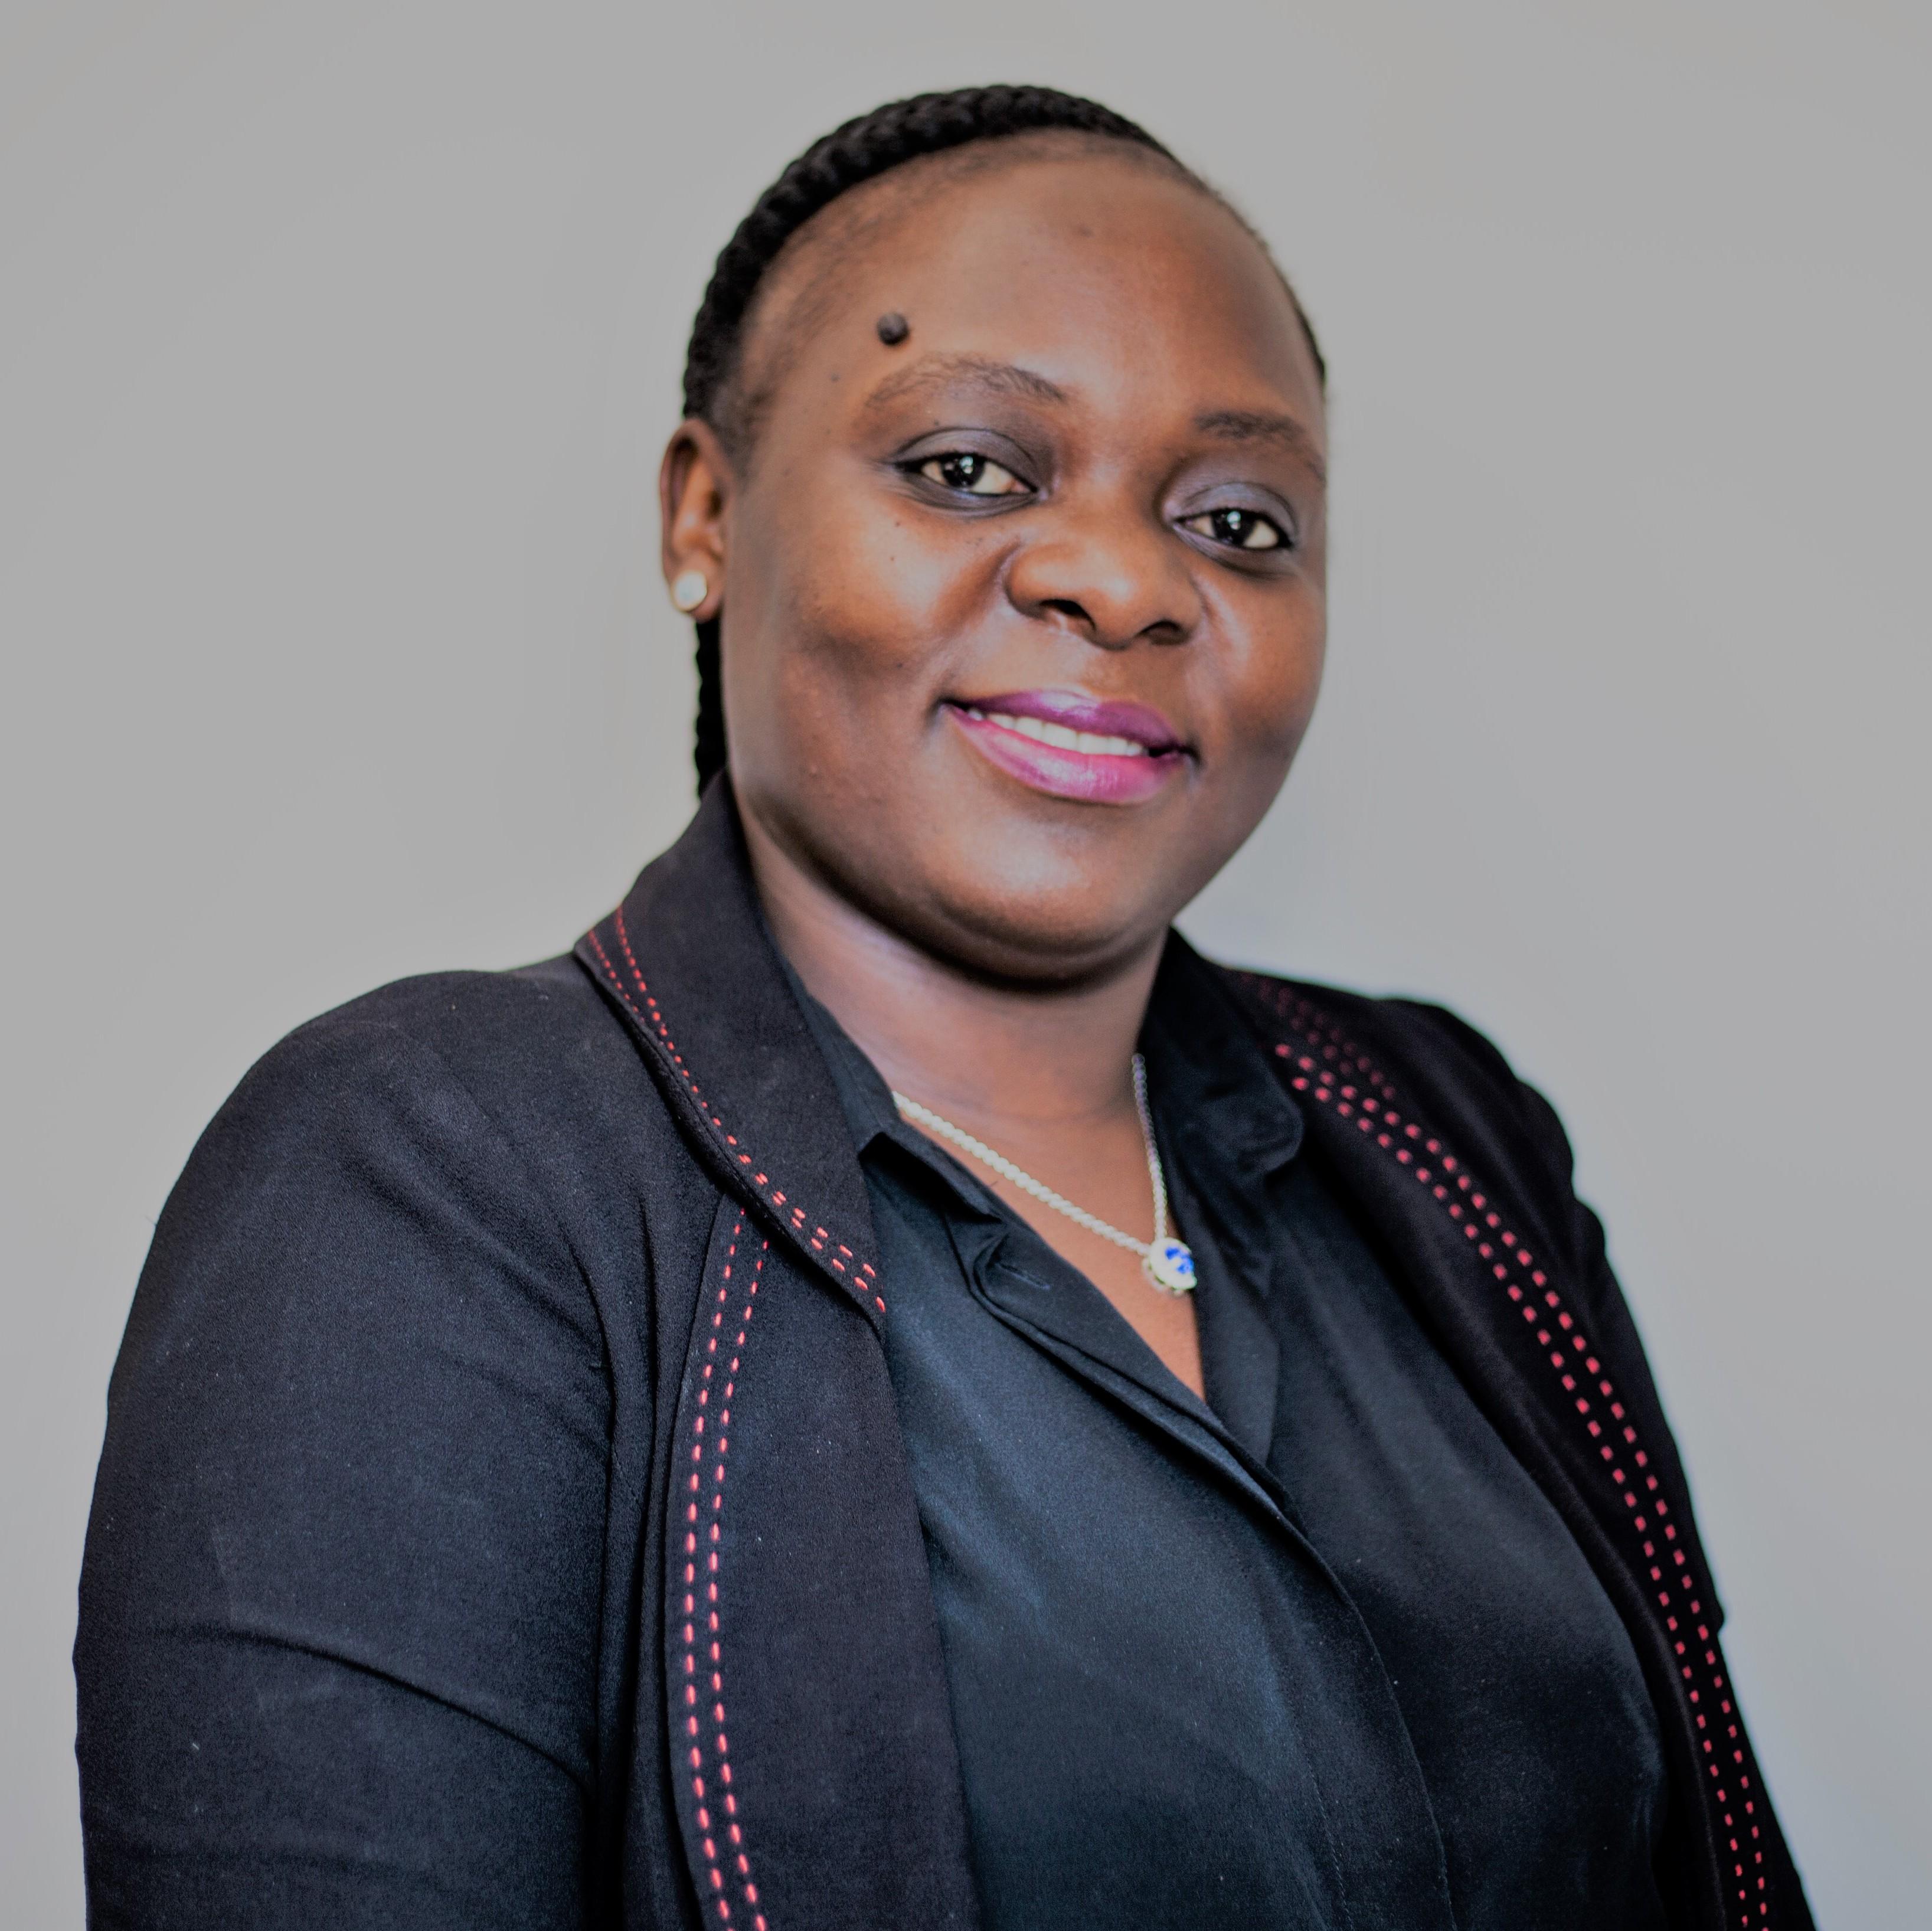 Chishala Lukwesa Siame